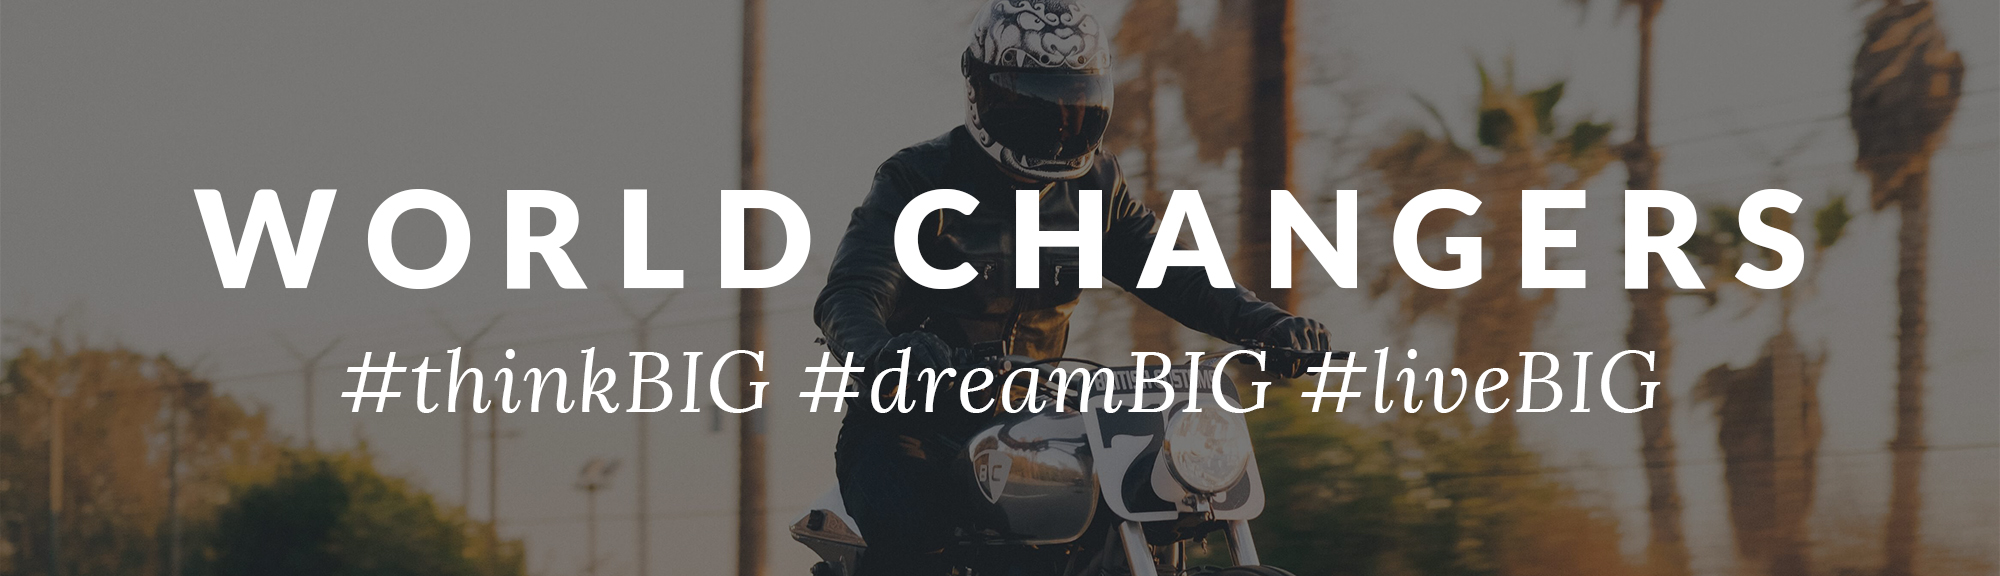 #thinkBIG #dreamBIG #liveBig Campaign New Year Goals 2018   Japheth Mast Blog